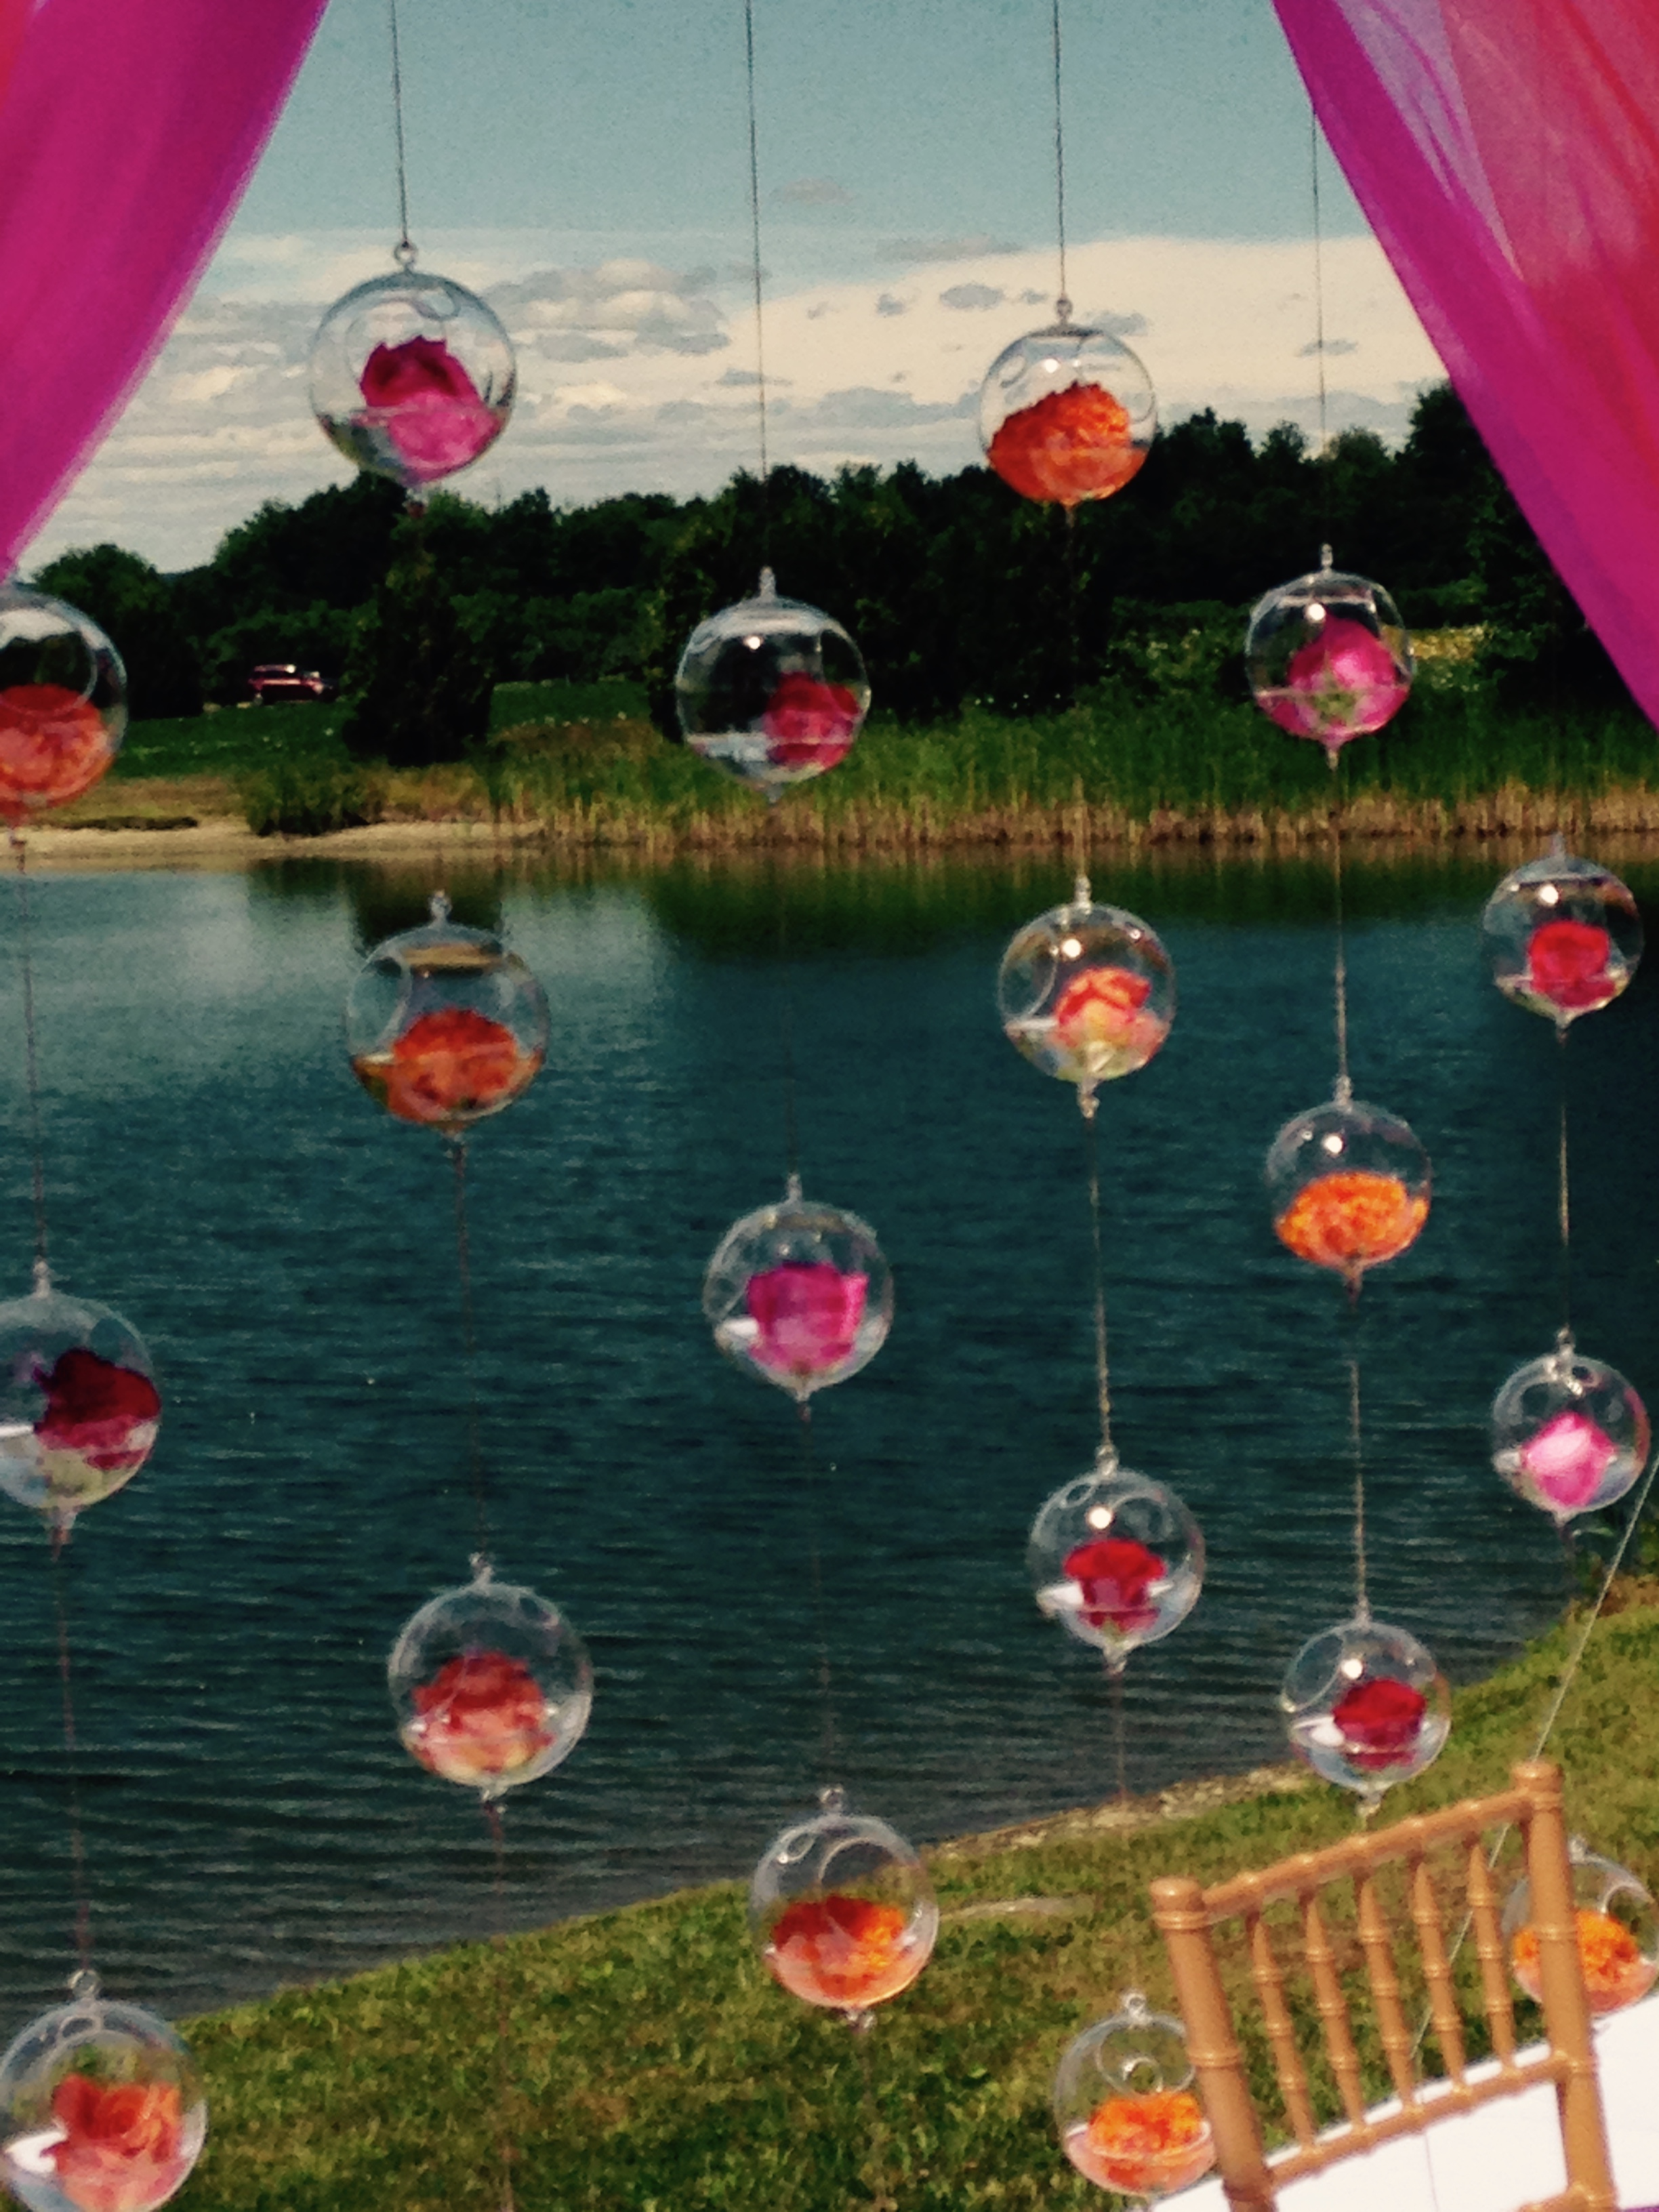 Hanging floral orbs